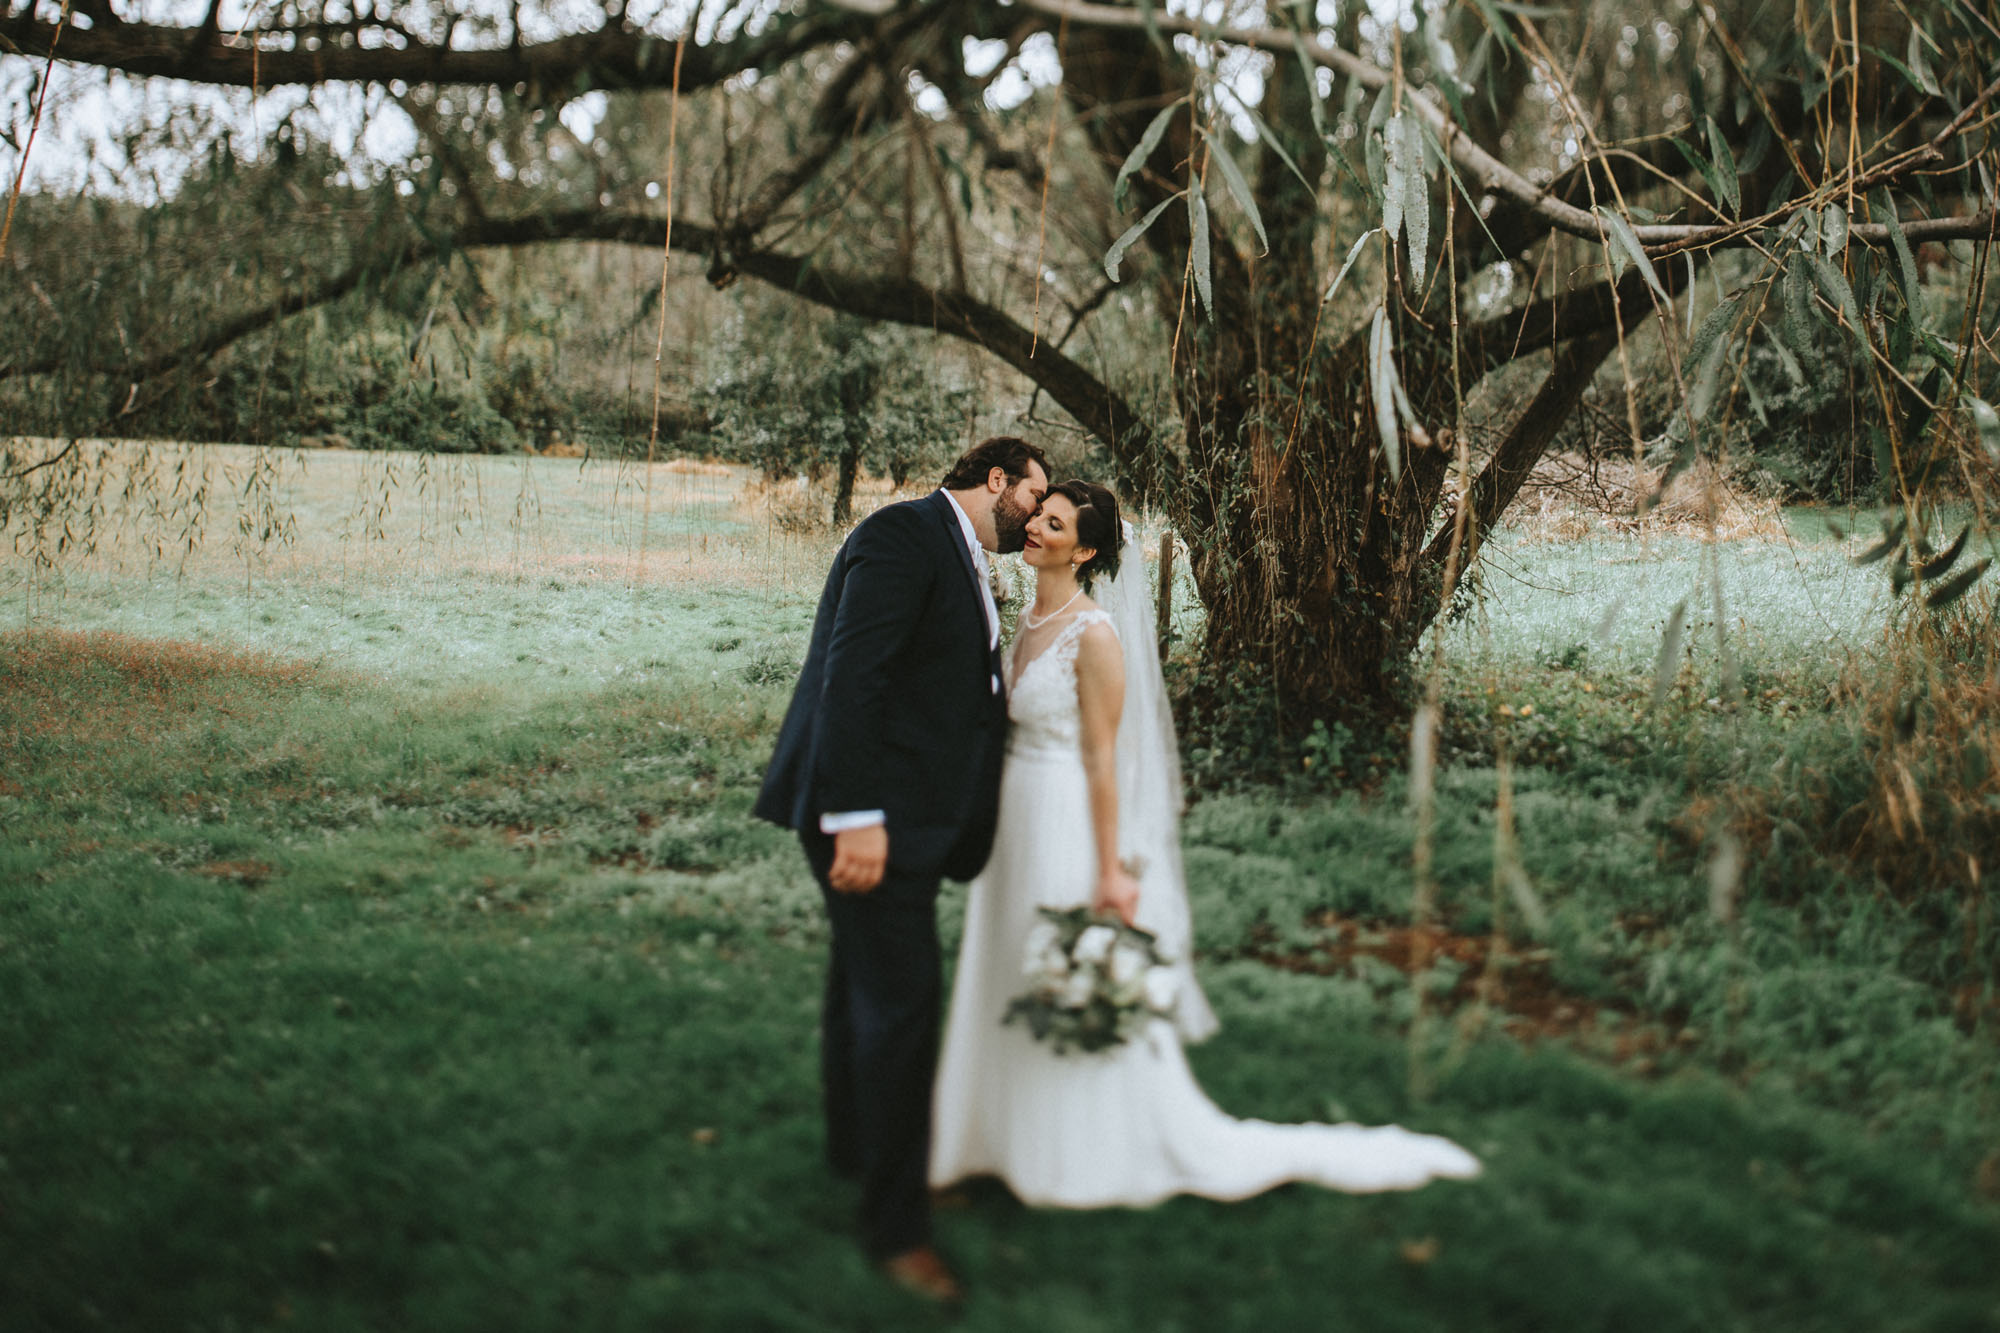 Twisted-Oaks-Studio-Arianne-Sean-Wedding-170.jpg